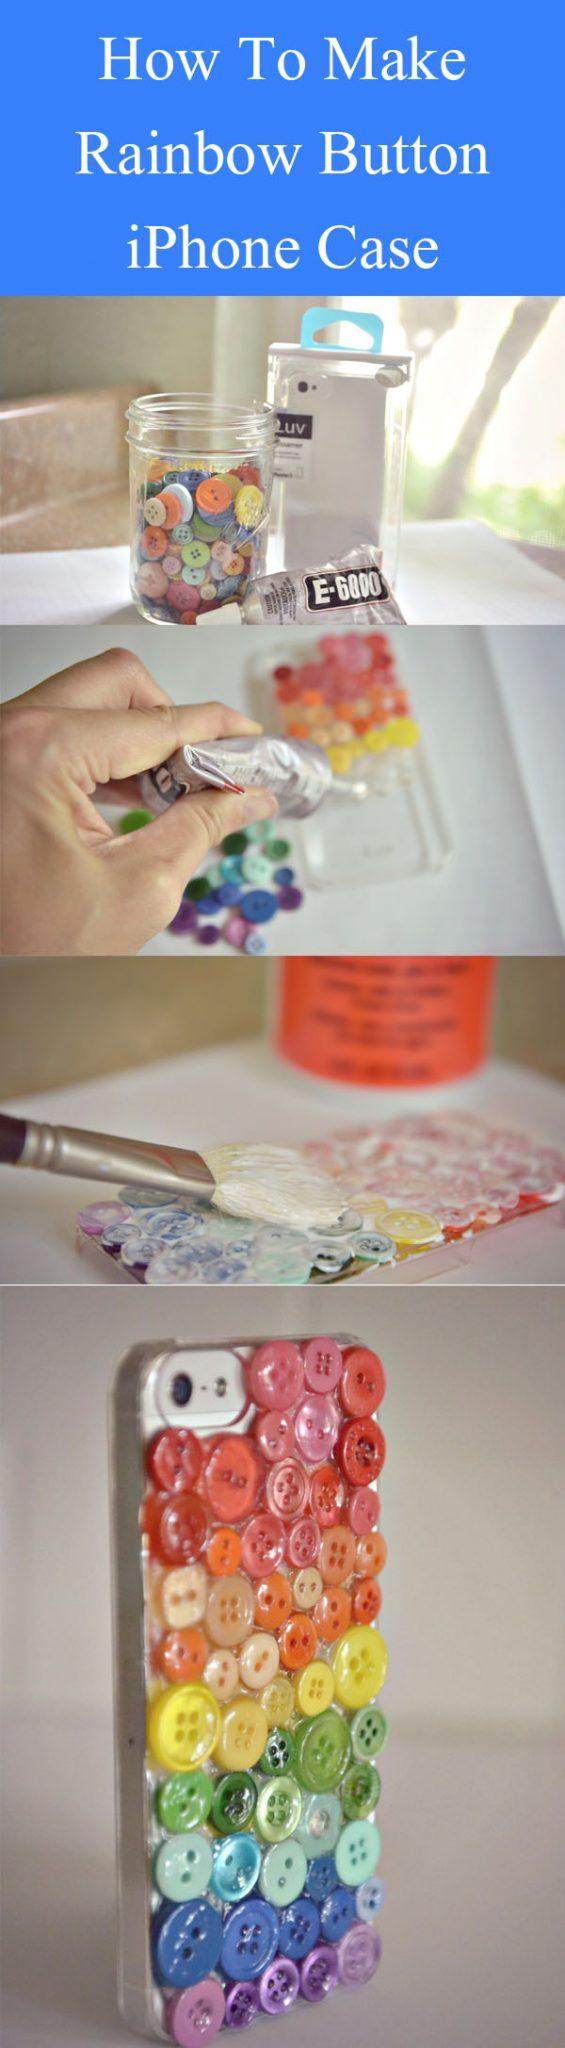 DIY Rainbow Button iPhone Case